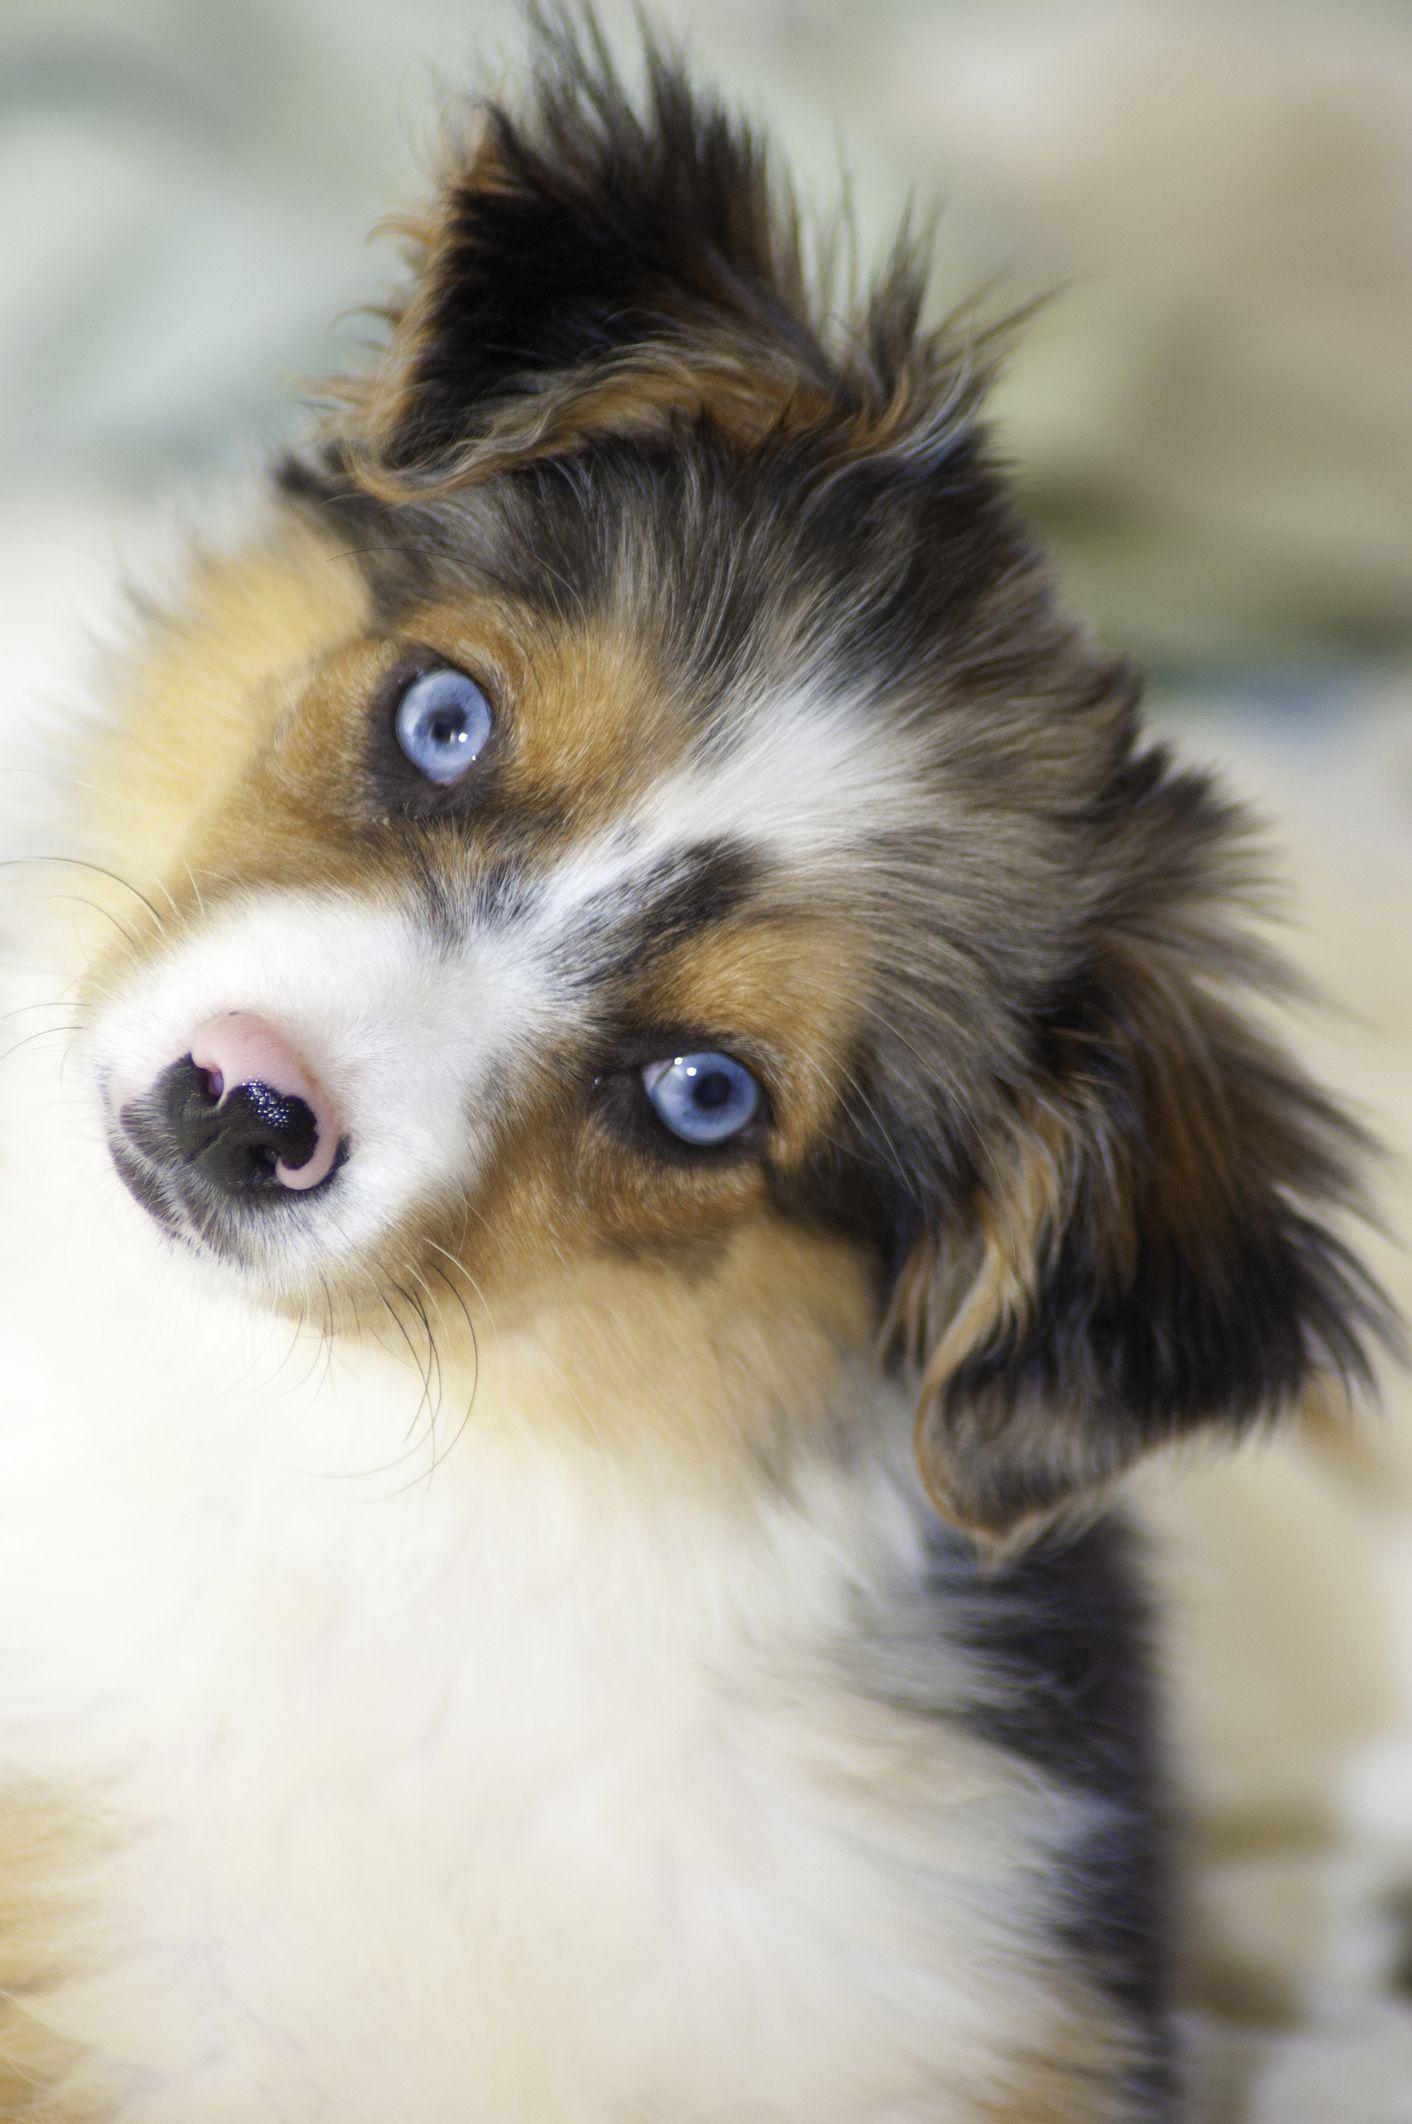 9 Dogs With Blue Eyes Australian Shepherd Siberian Husky And More